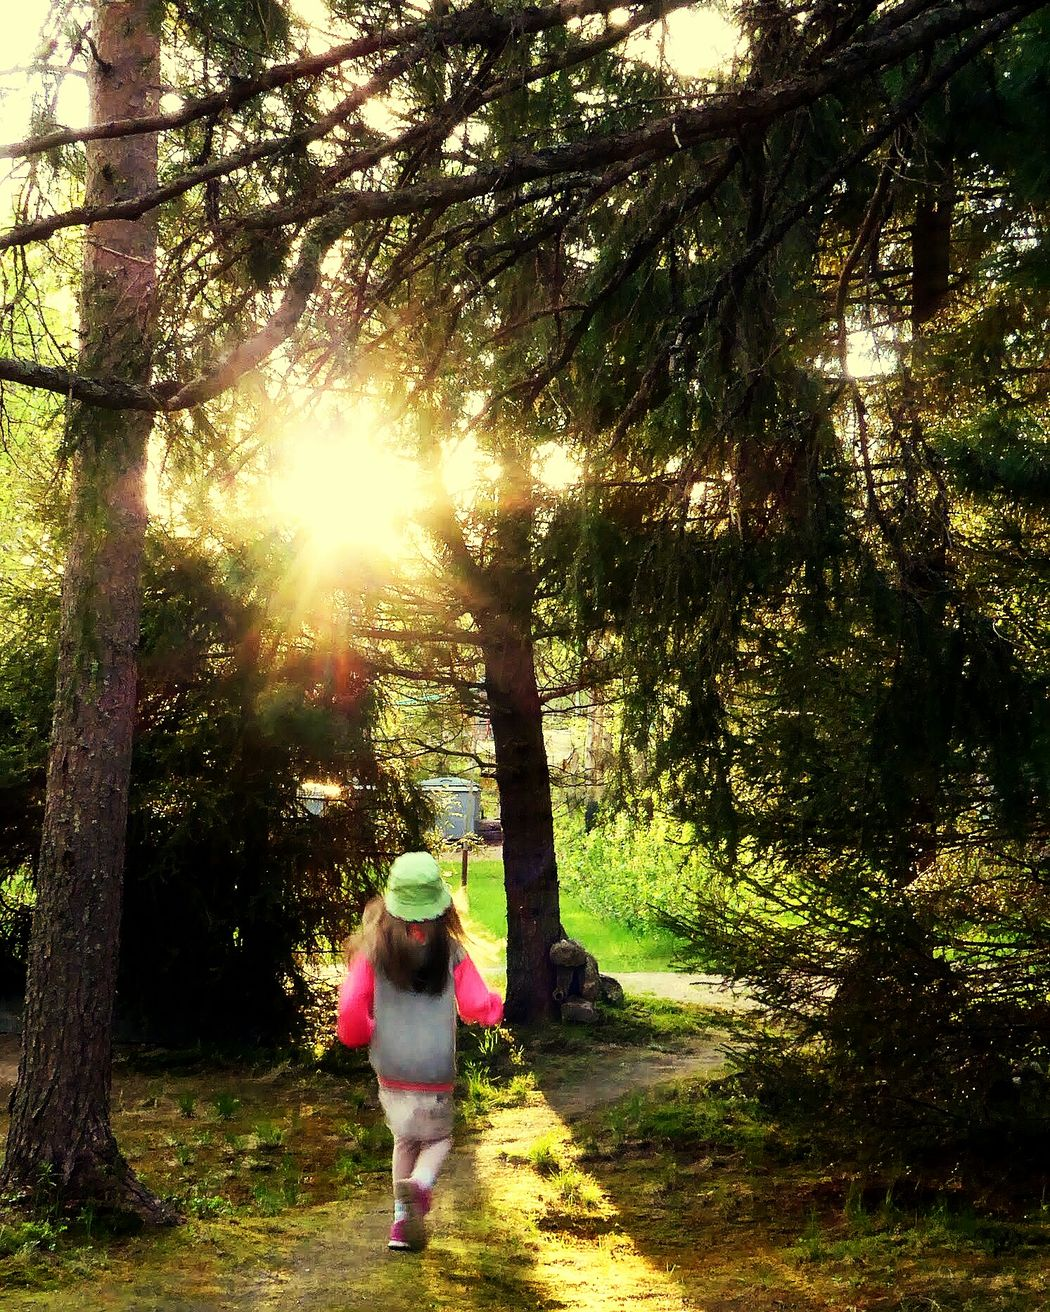 Childhood Precious Moments Of Life Ilovemygrandchildren 💜 Sunlight Tree Outdoors Nature Arcticsummer Lapland, Finland Iloveolddoors 💜life Is Good 💙 Amazing Day Nature Lapland, Finland Arctic Light Beauty In Nature Naturelovers Summer Vibes